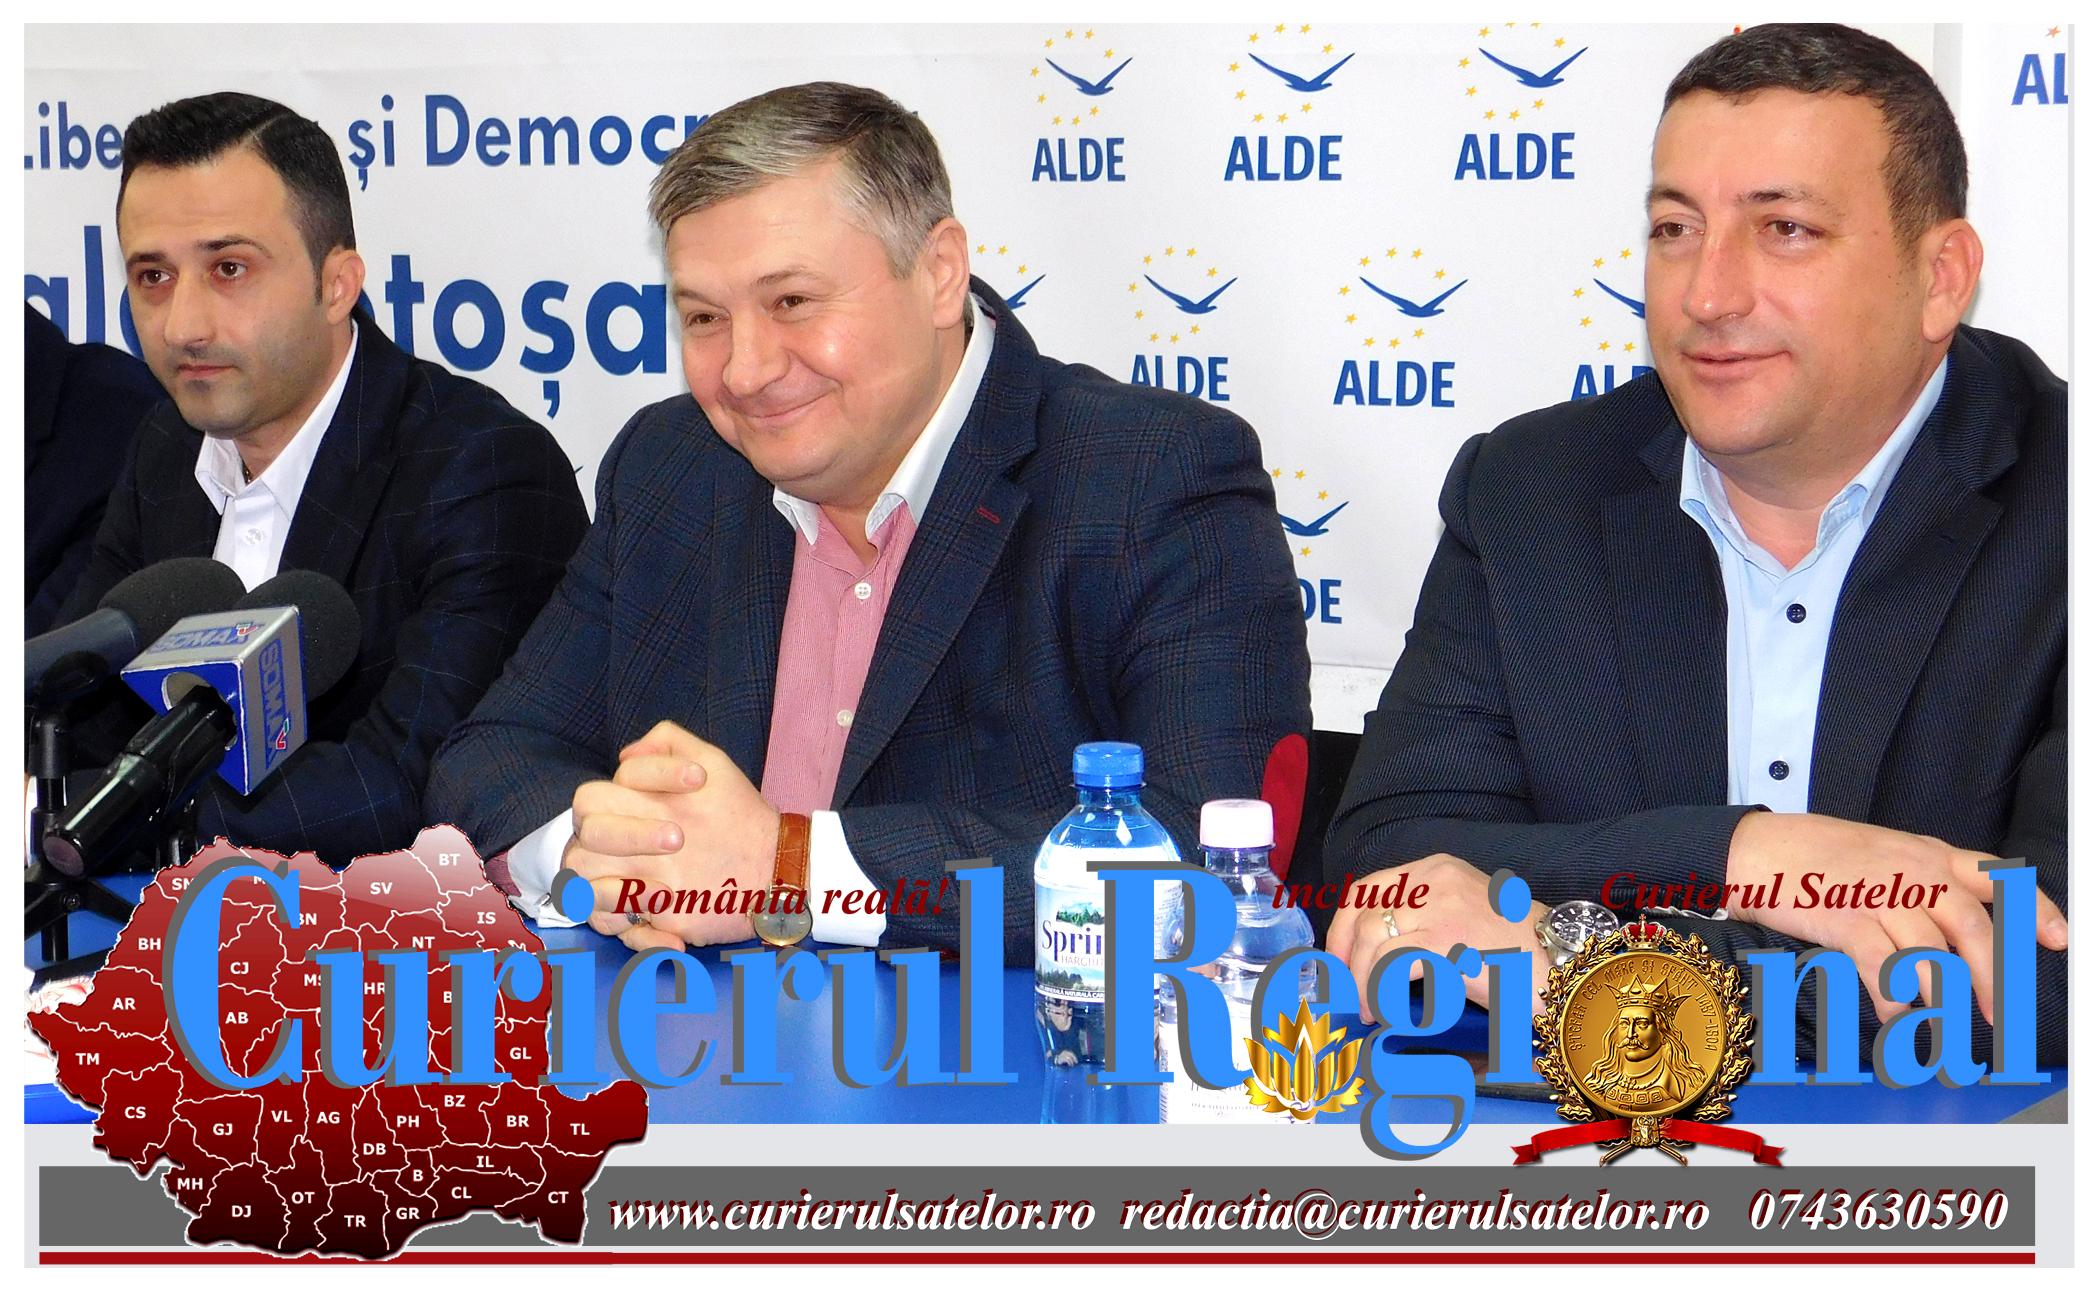 Opriti circul pe bani publici - cere ALDE Botosani 31